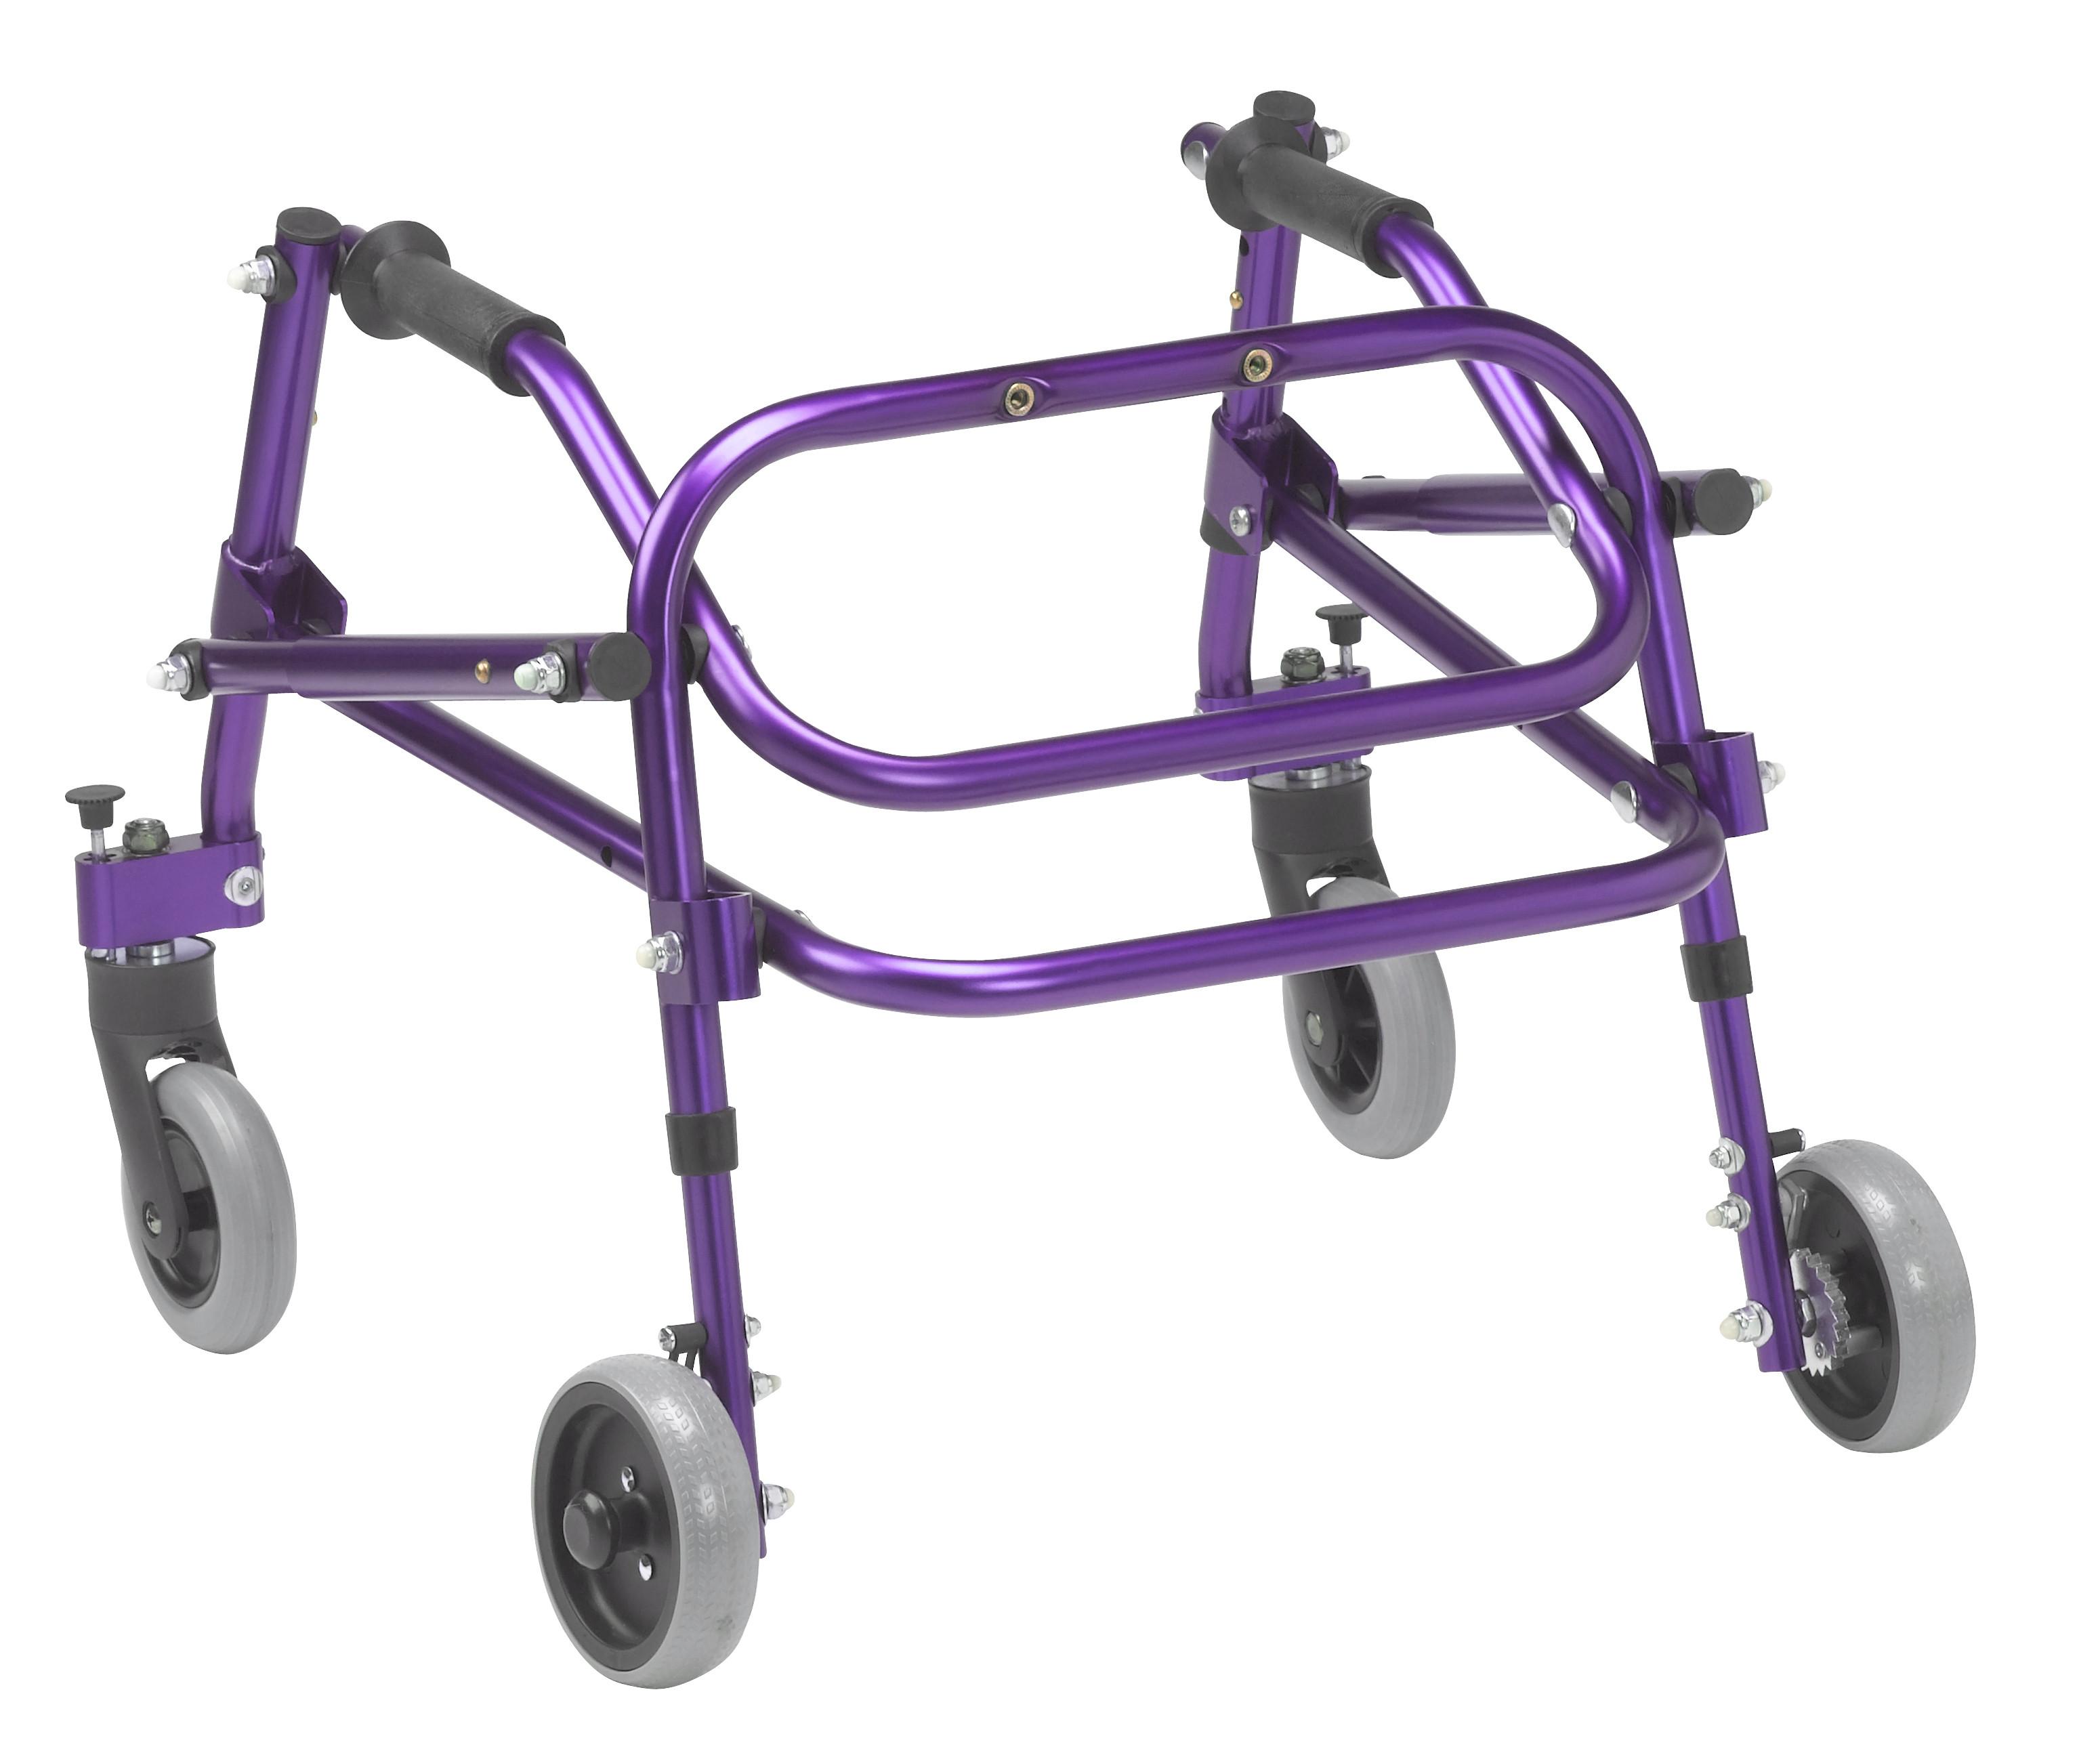 Nimbo 2G Lightweight Posterior Walker - Large - Wizard Purple - Angle View